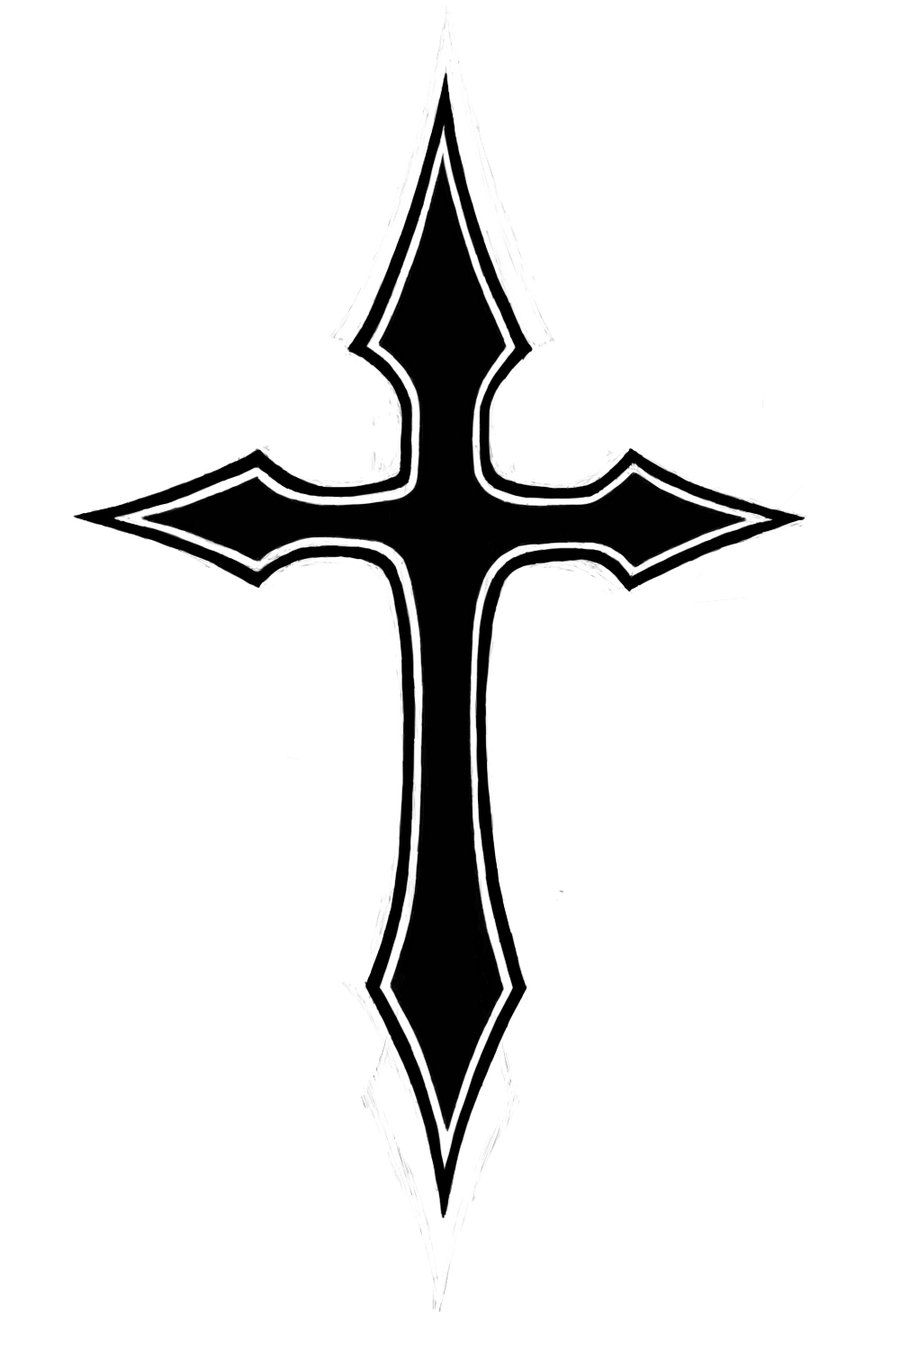 Pin on regular crosses.